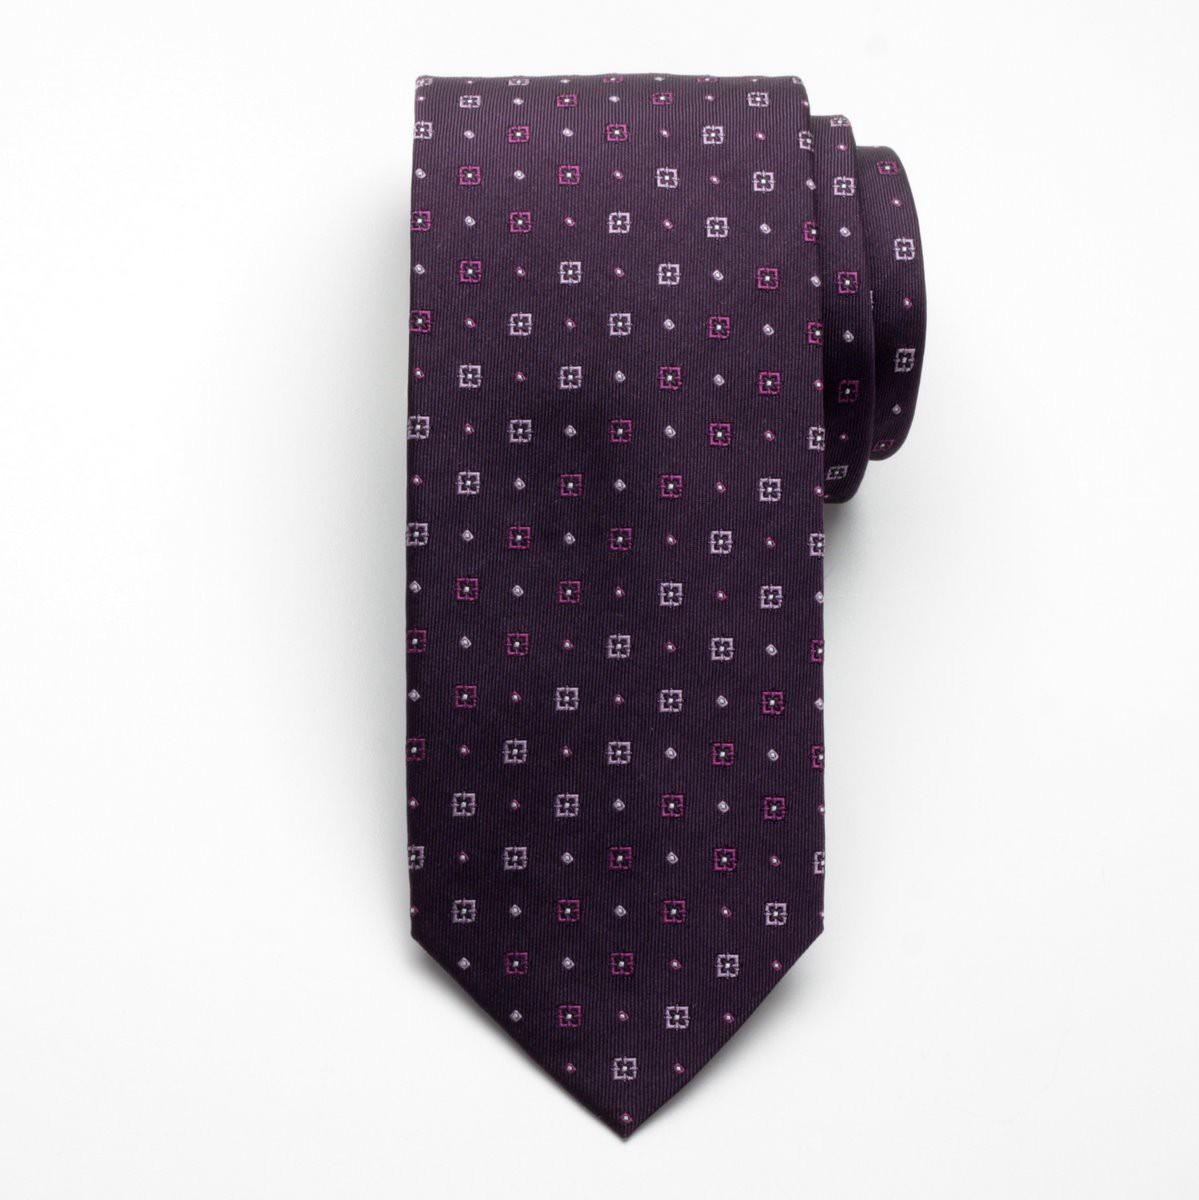 Krawat jedwabny Fine Selection (wzór 100)